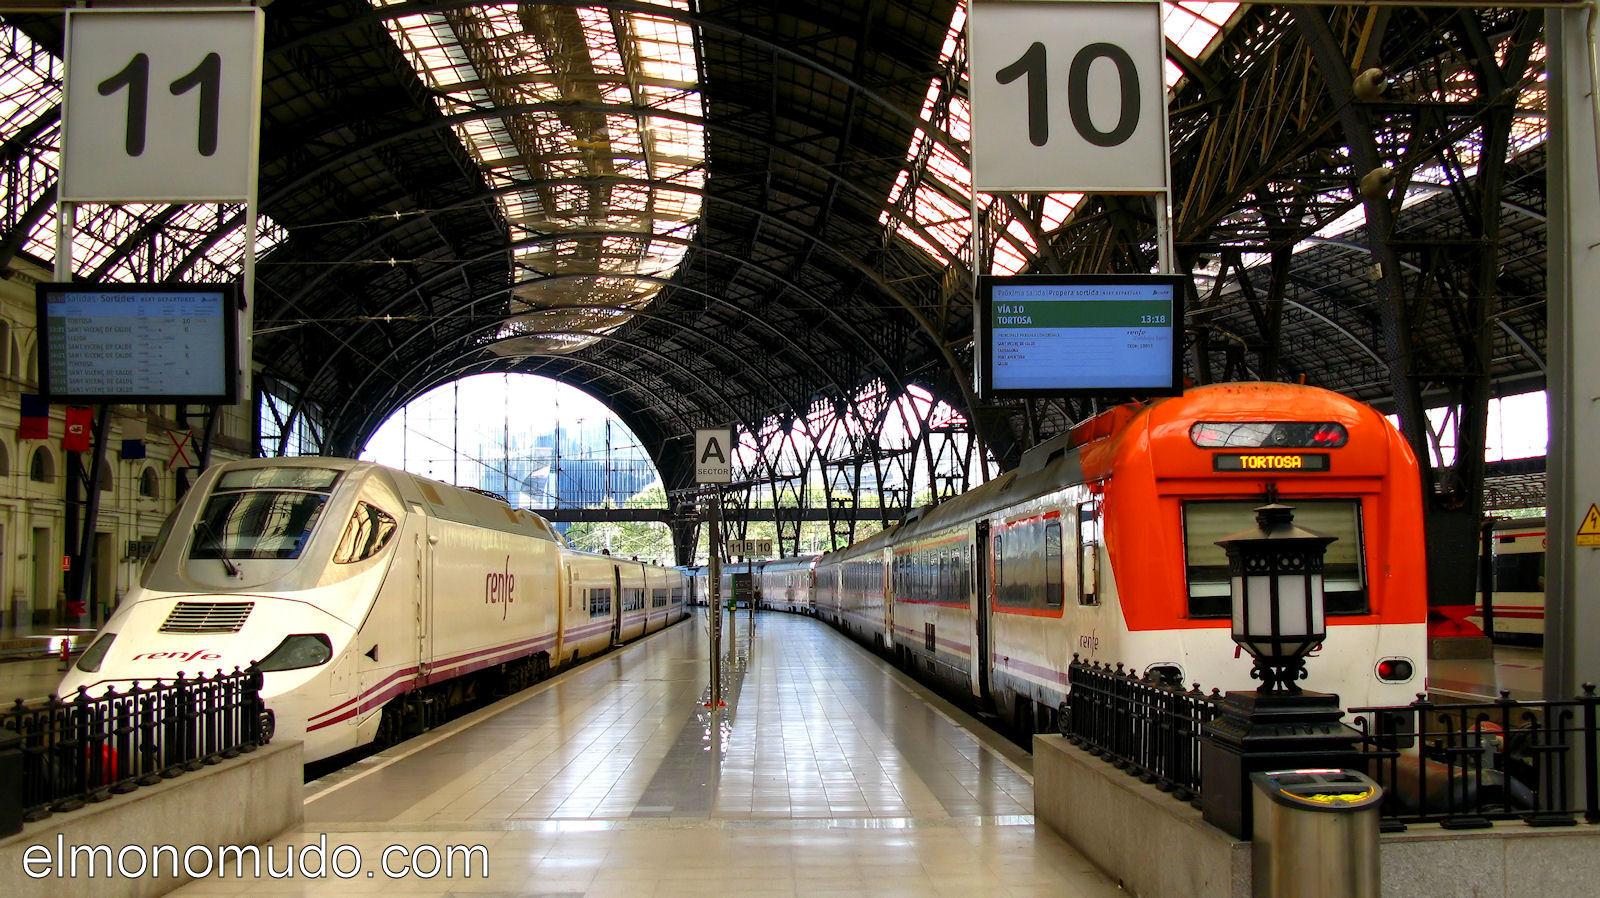 estacion_de_francia_barcelona_2010_1